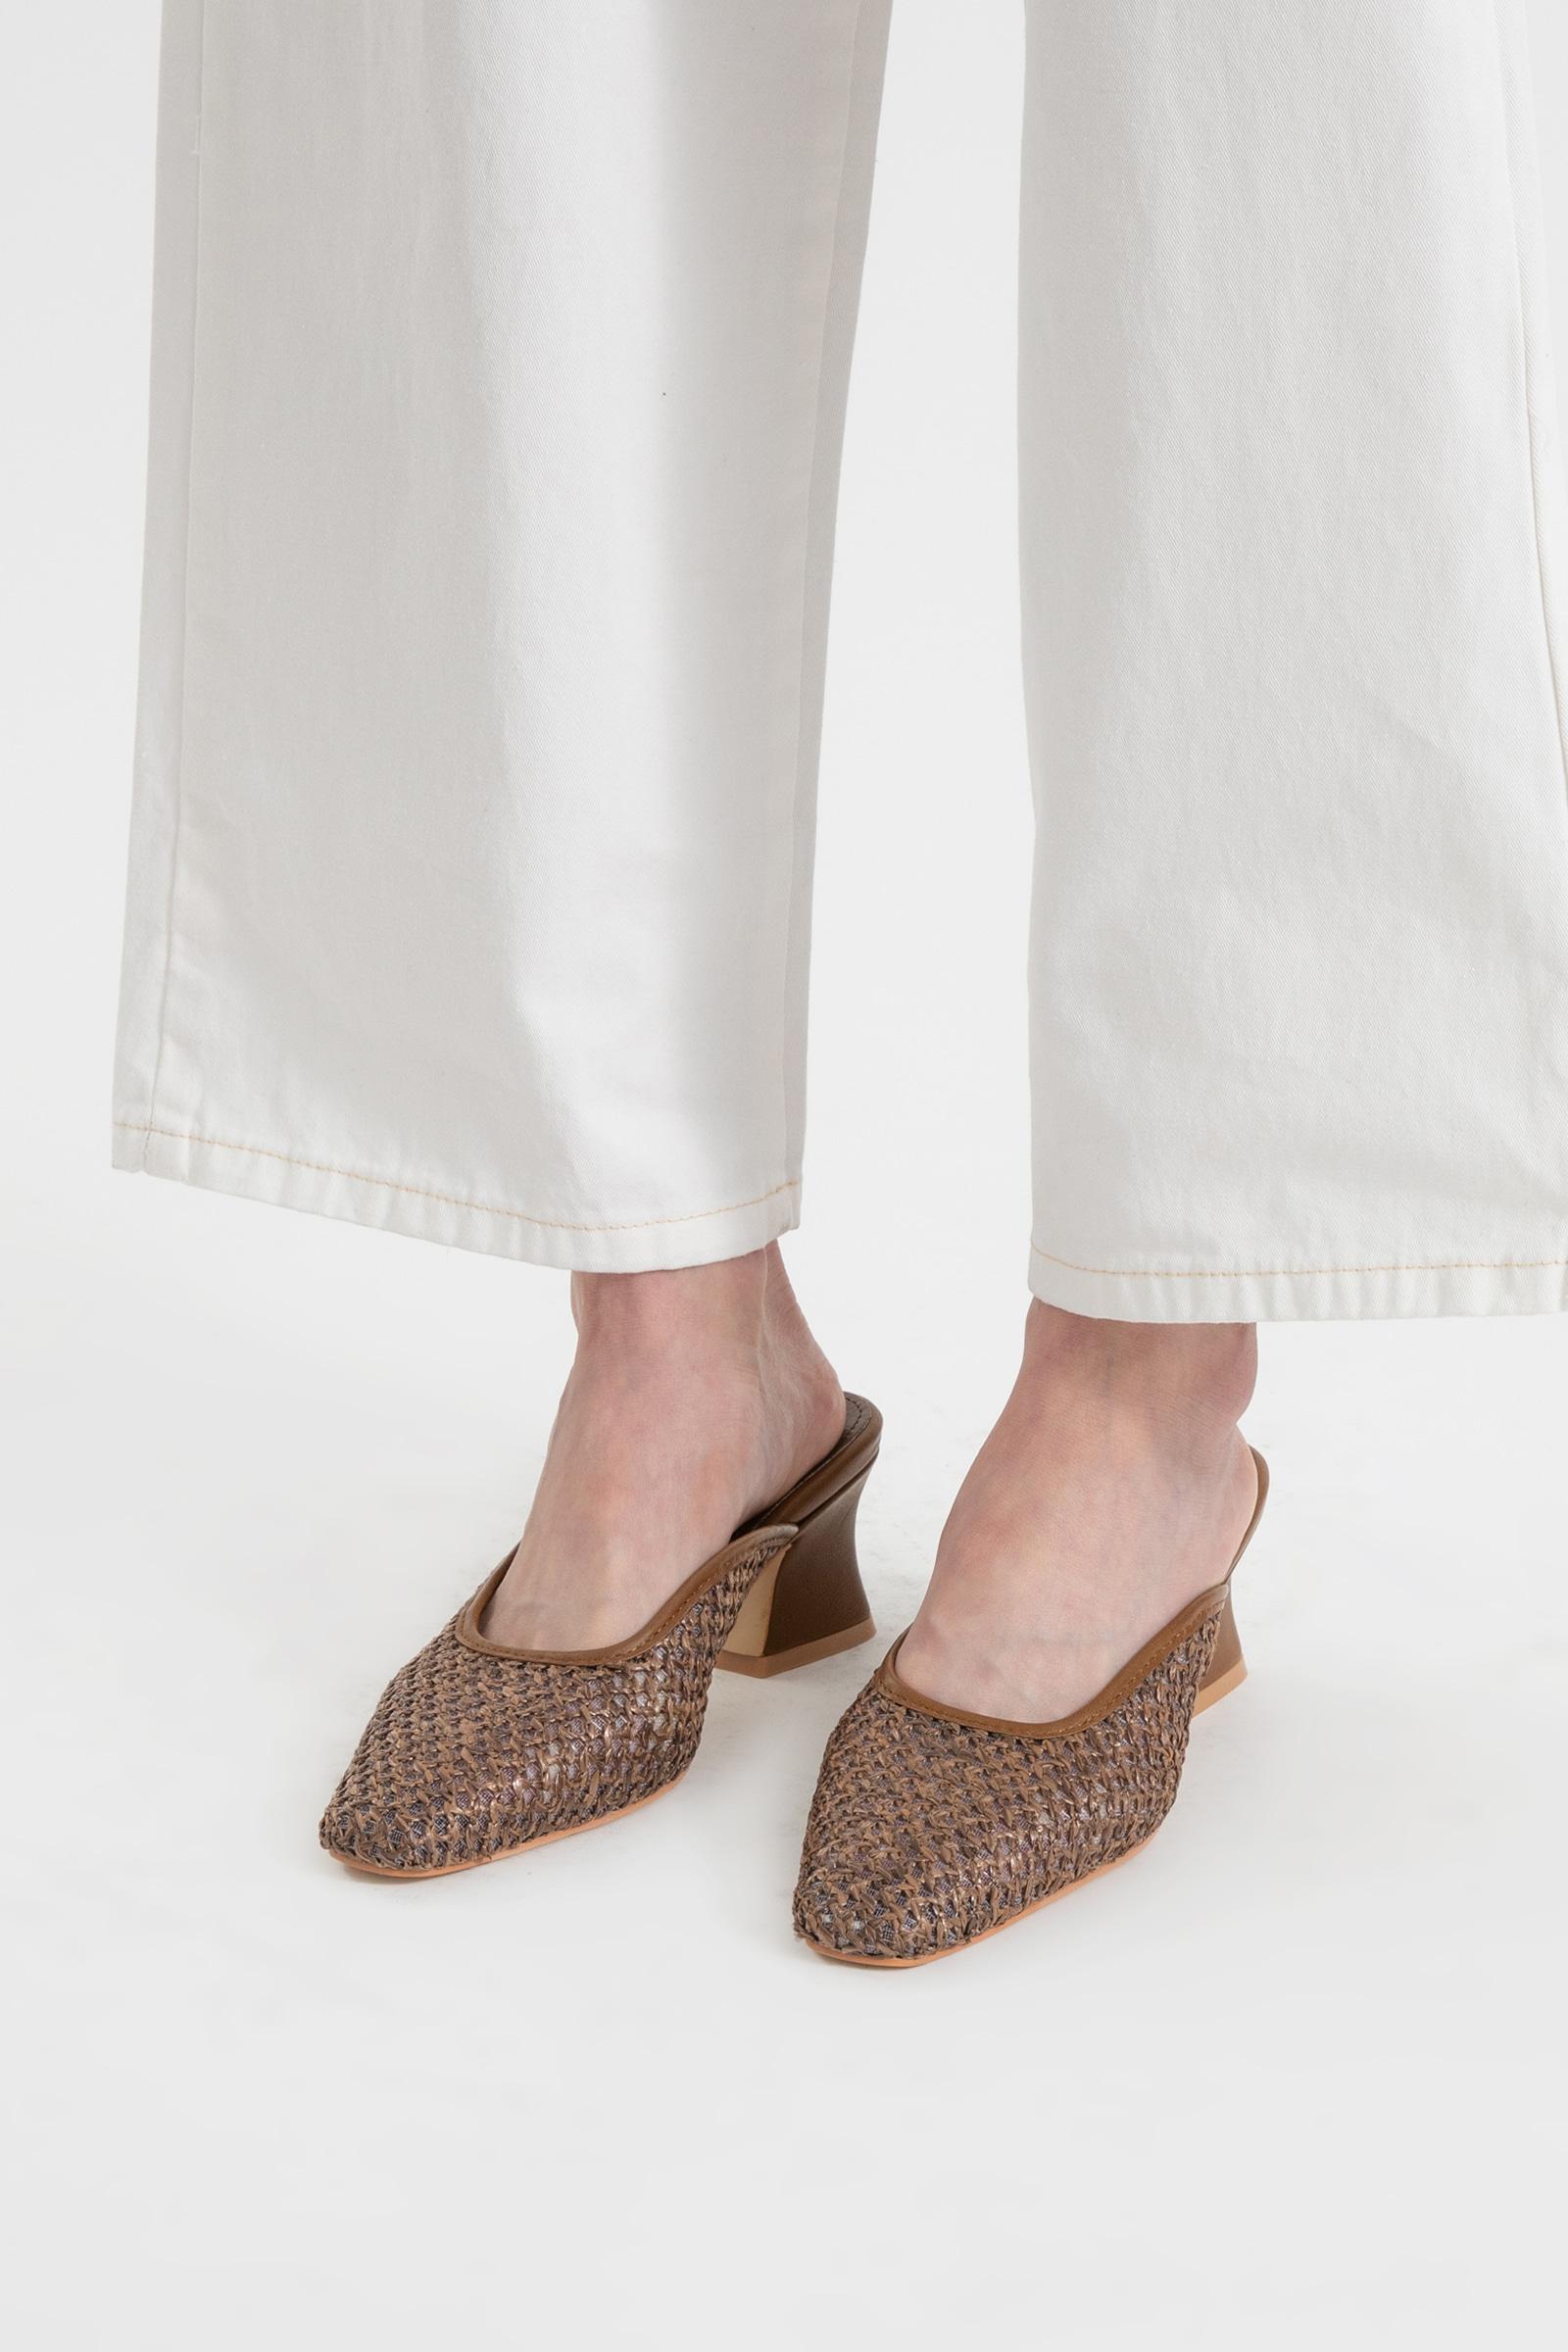 Ocean Daily Long Wide Cotton Pants